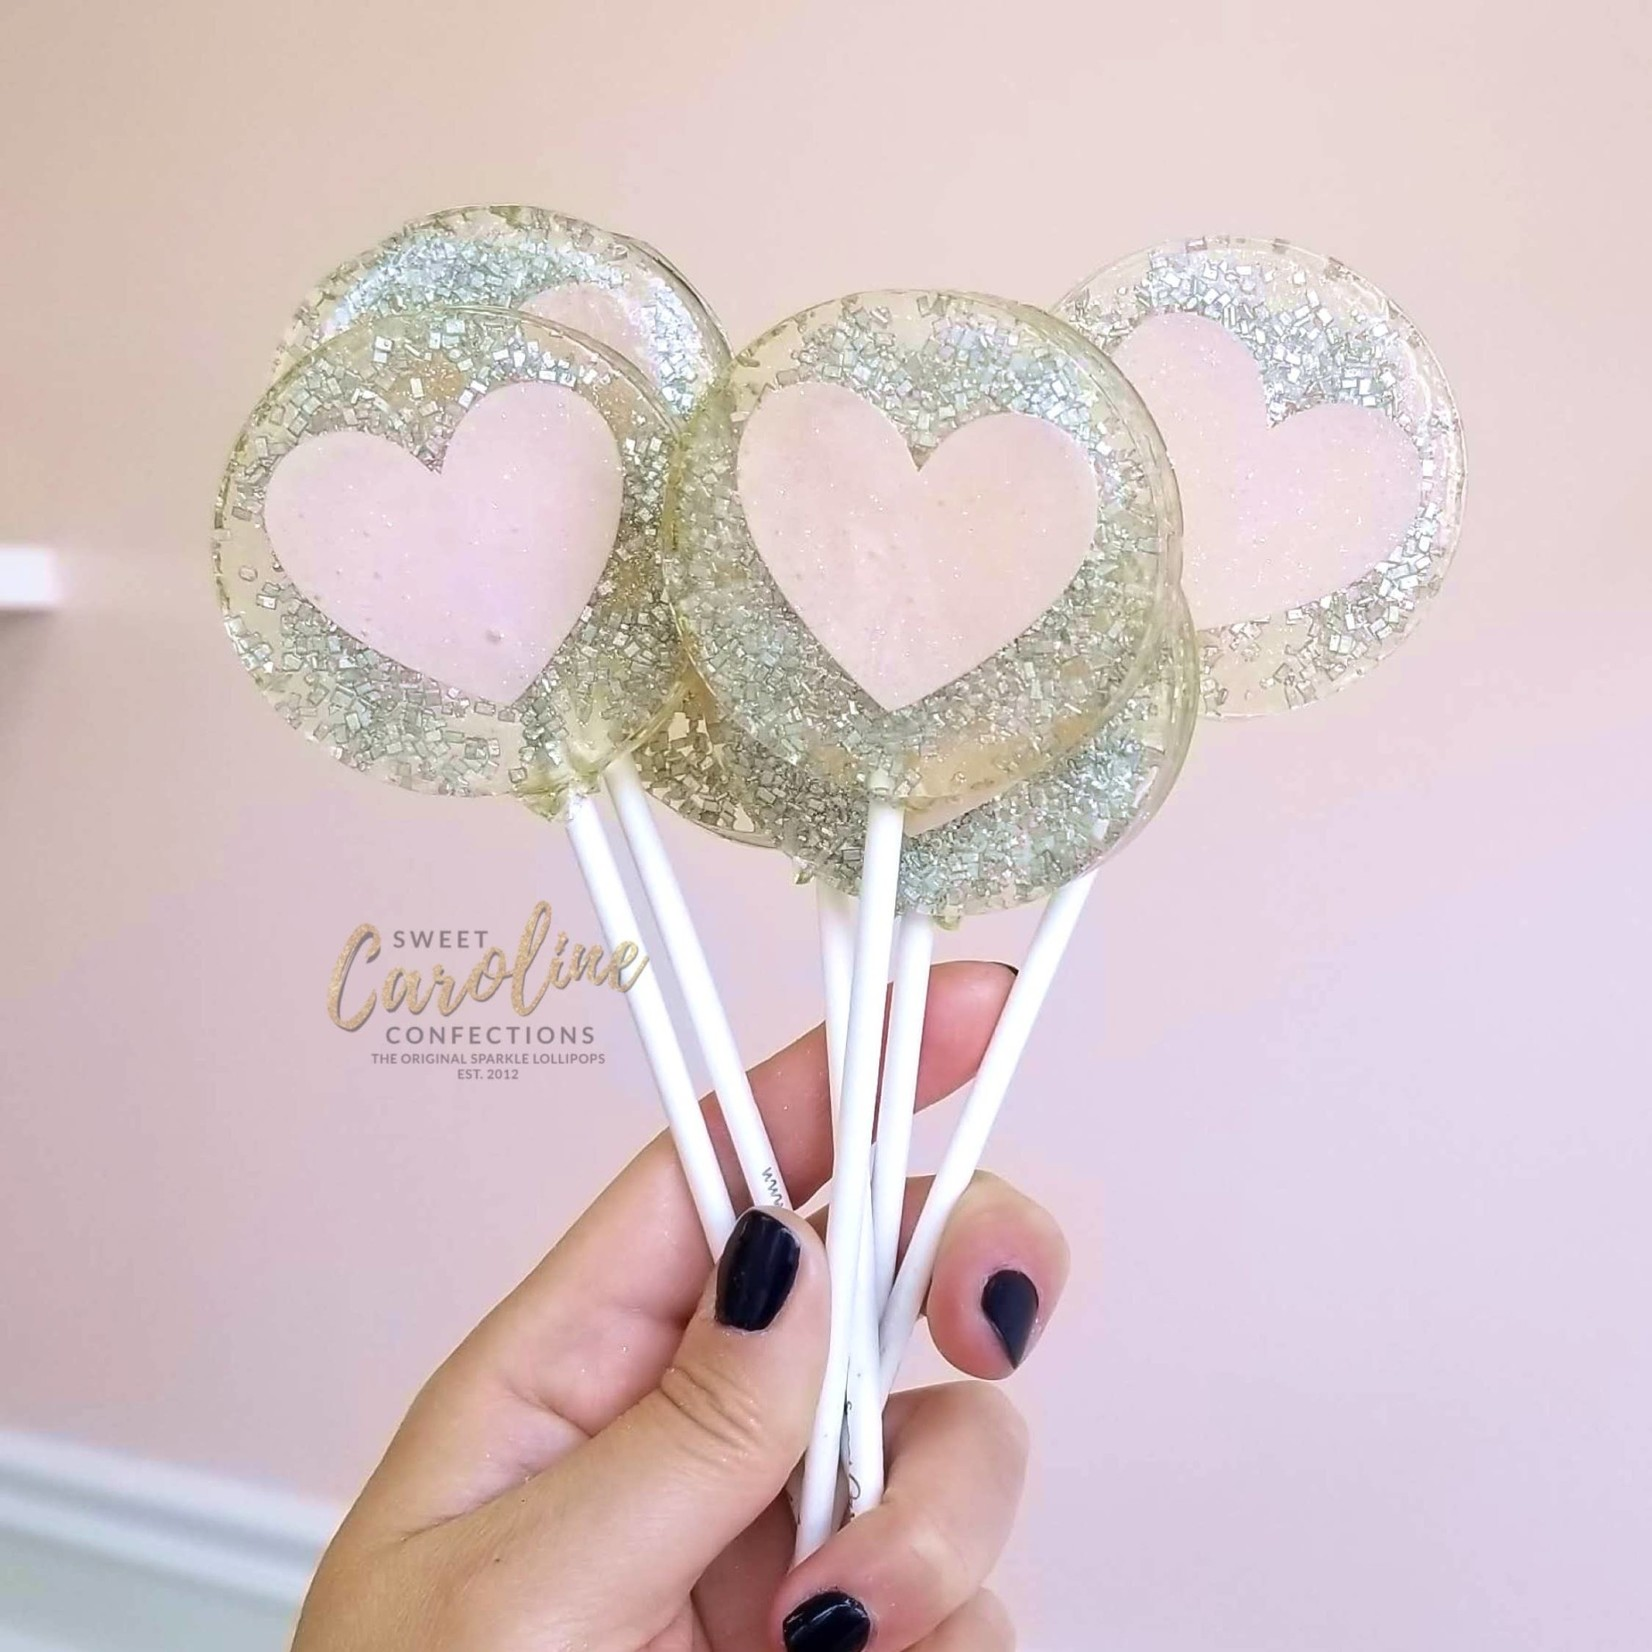 Silver & Pink Heart Lollipop, Champagne Flavor